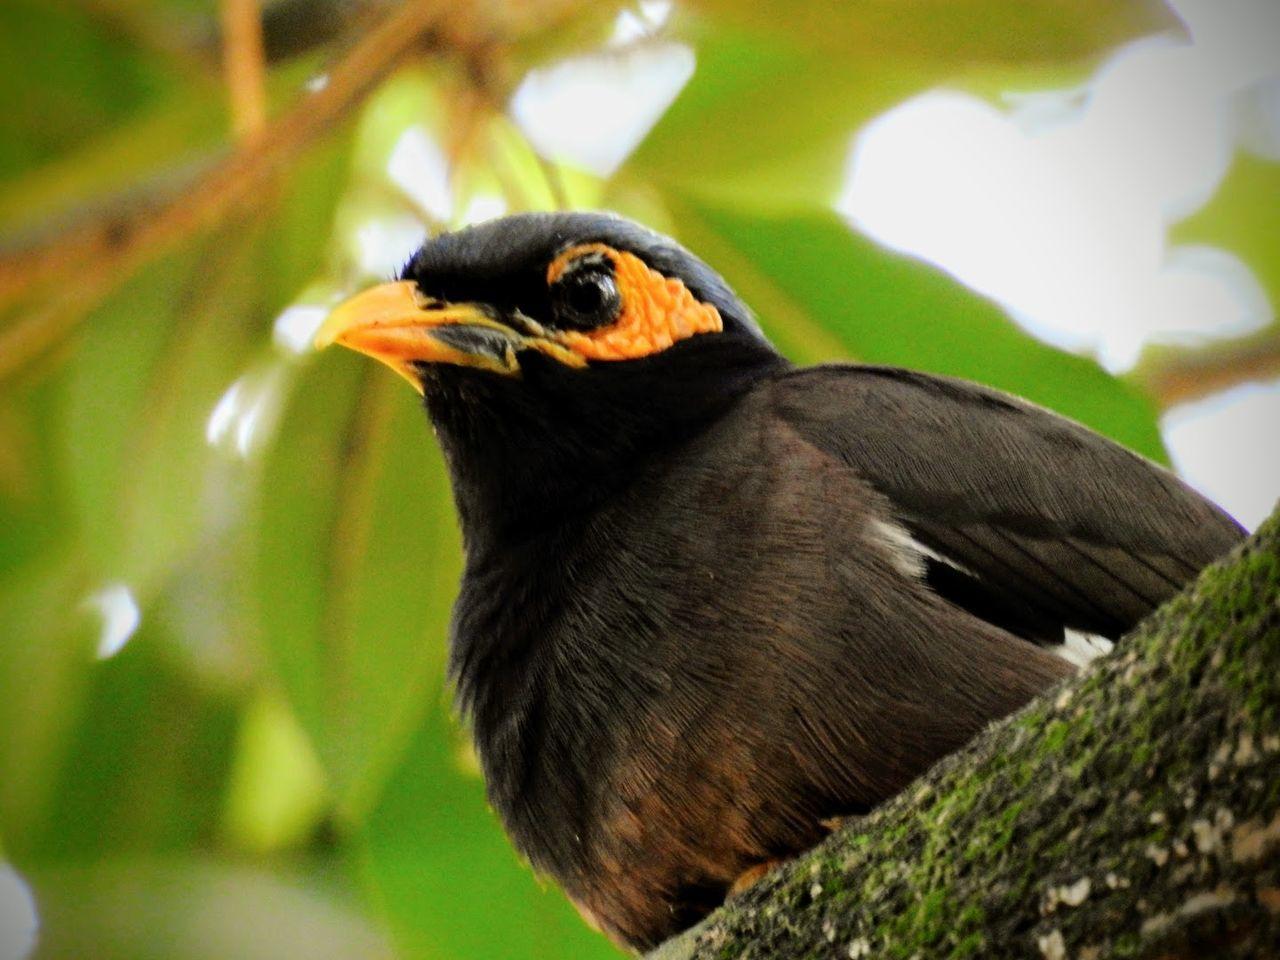 A mynah bird sitting on a branch Bird Animal Themes One Animal Nature Close-up Beak No People Outdoors Perching